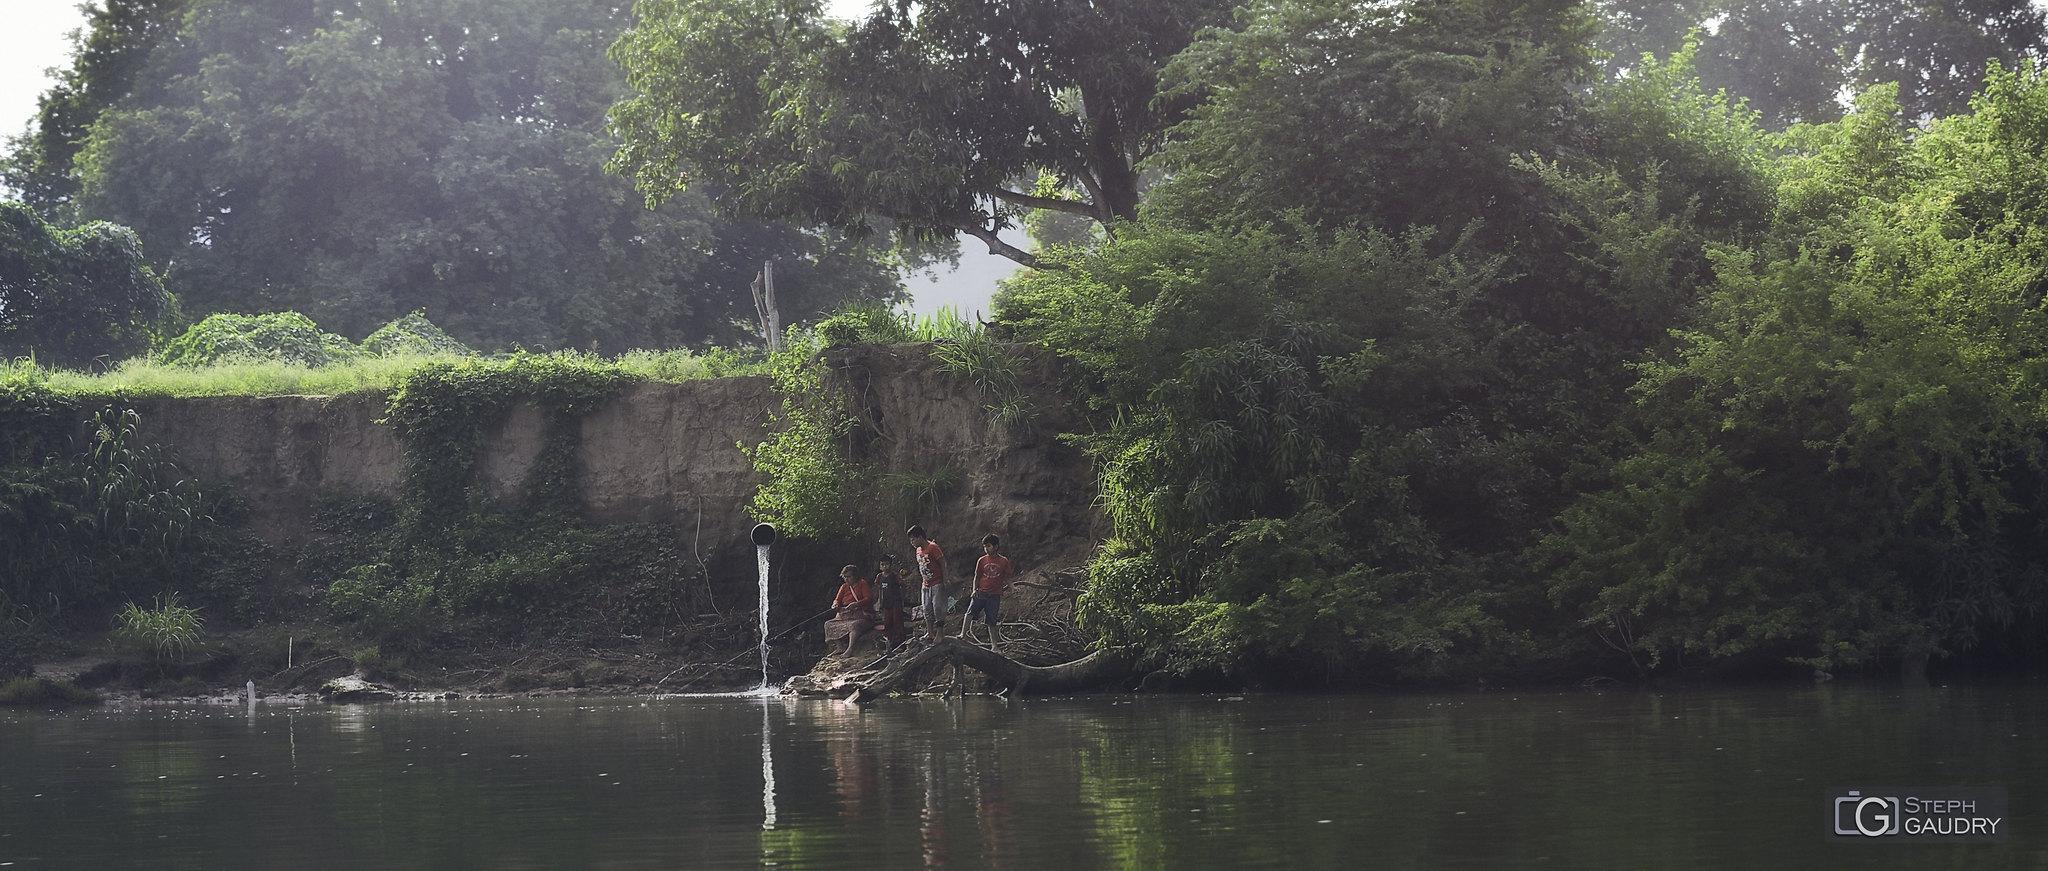 Río Grijalva (MEX) [Cliquez pour lancer le diaporama]